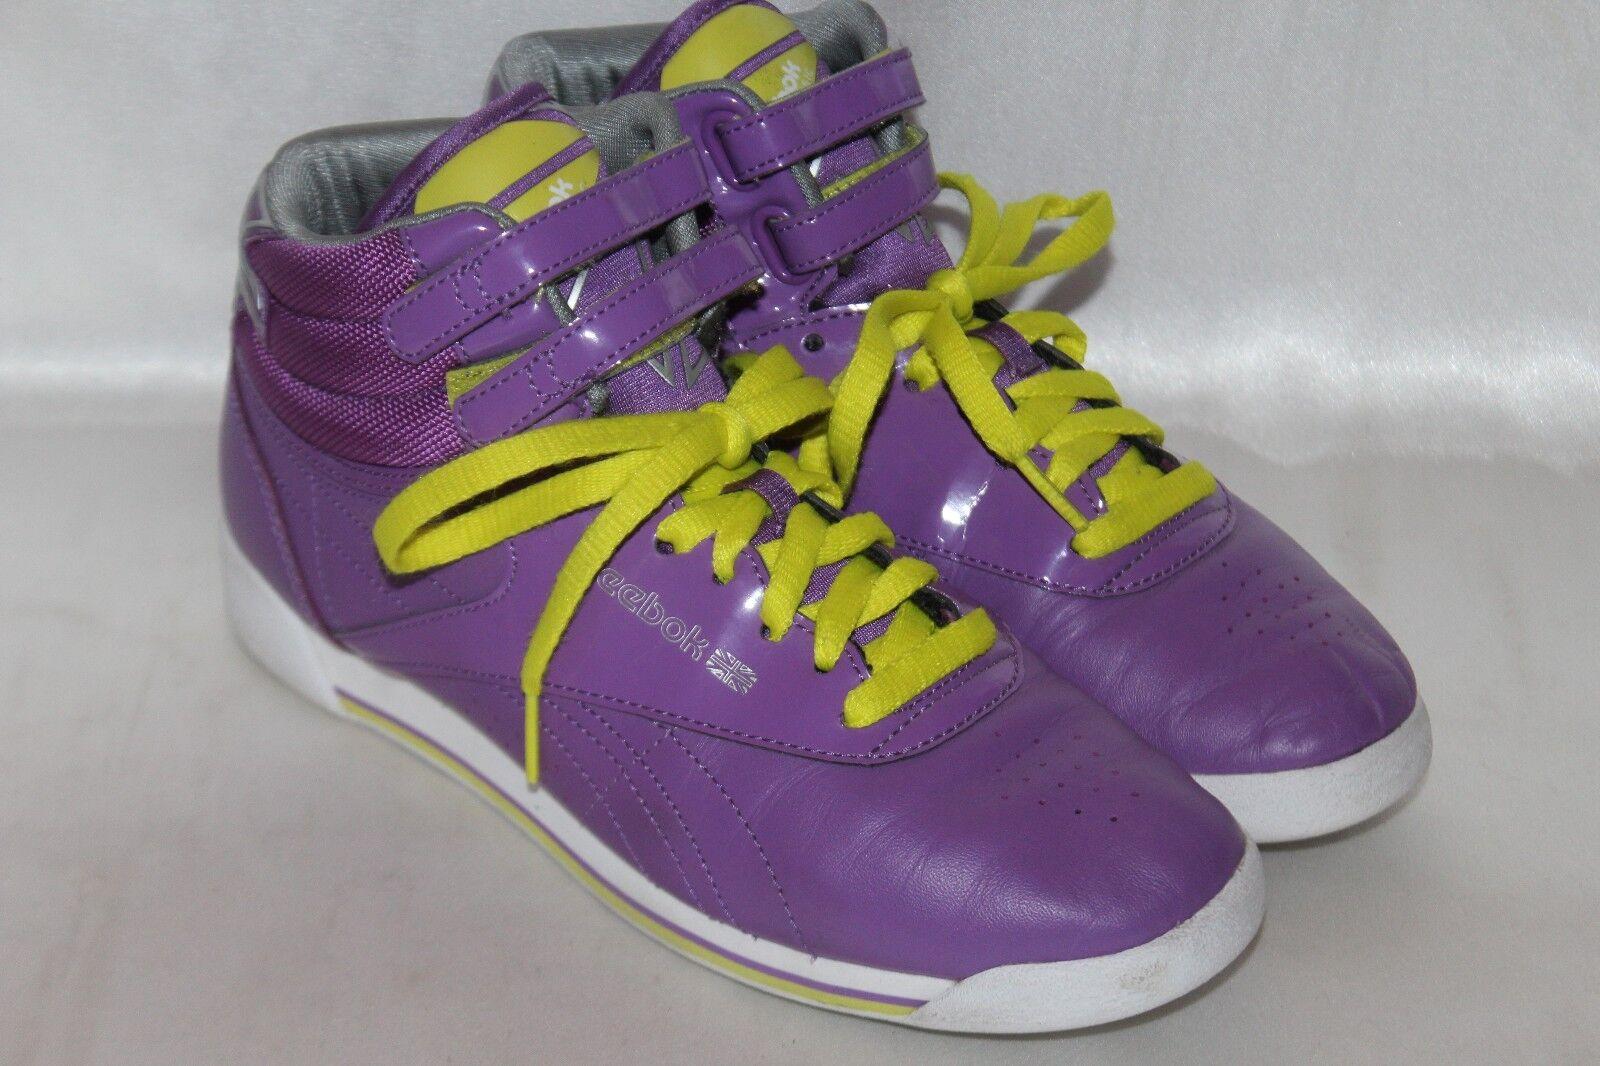 REEBOK Classic Classic Classic FREESTYLE Retro 80's purple High Hi Top Sneakers shoes Sz 8 ee6f67